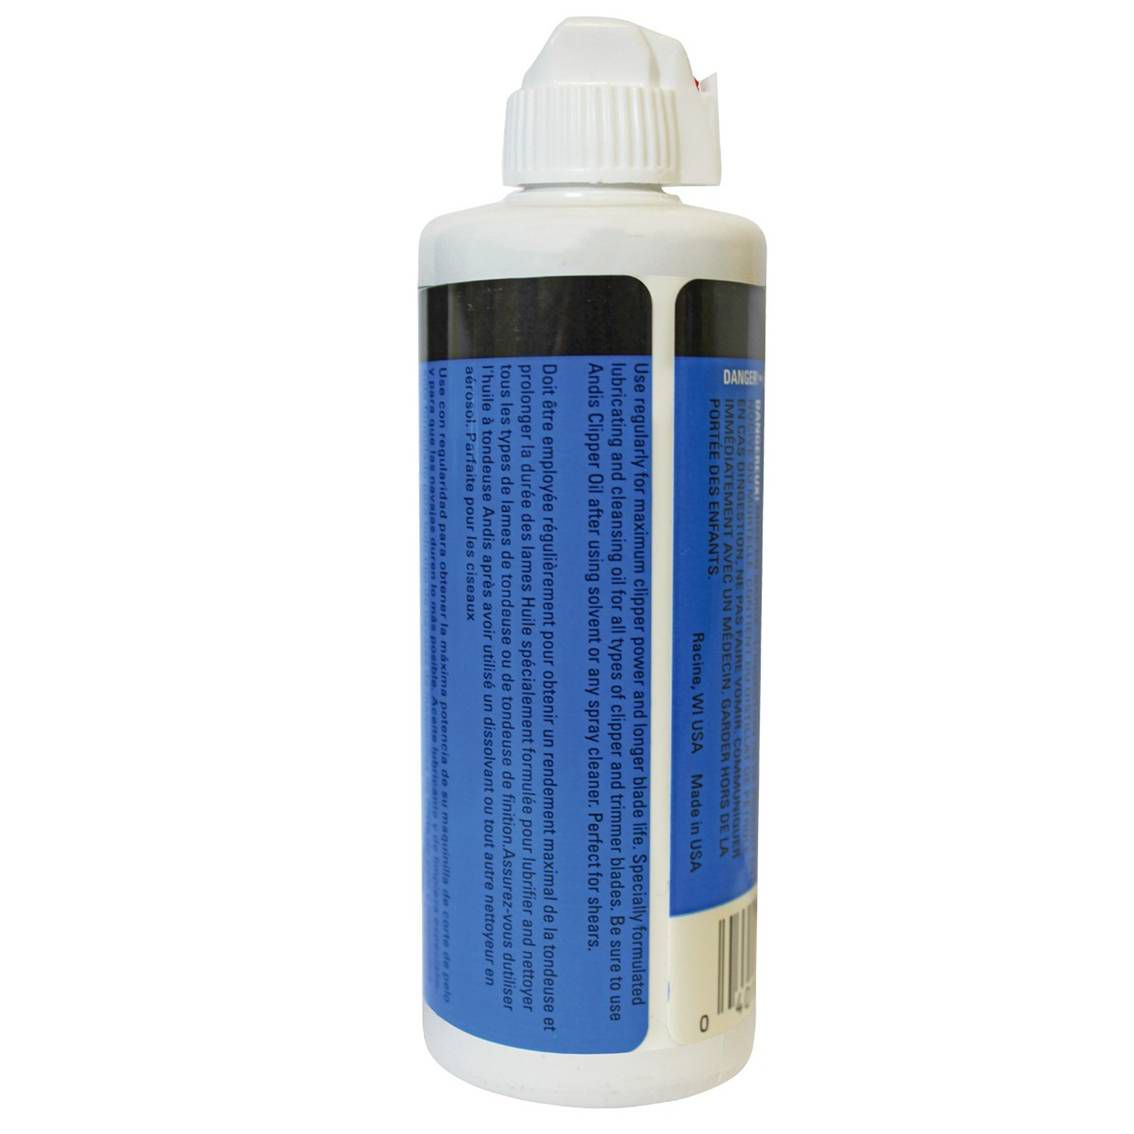 Óleo Lubrificante para Máquinas de Cortes, Lâminas e Tesouras 118ml - Clipper Oil Andis